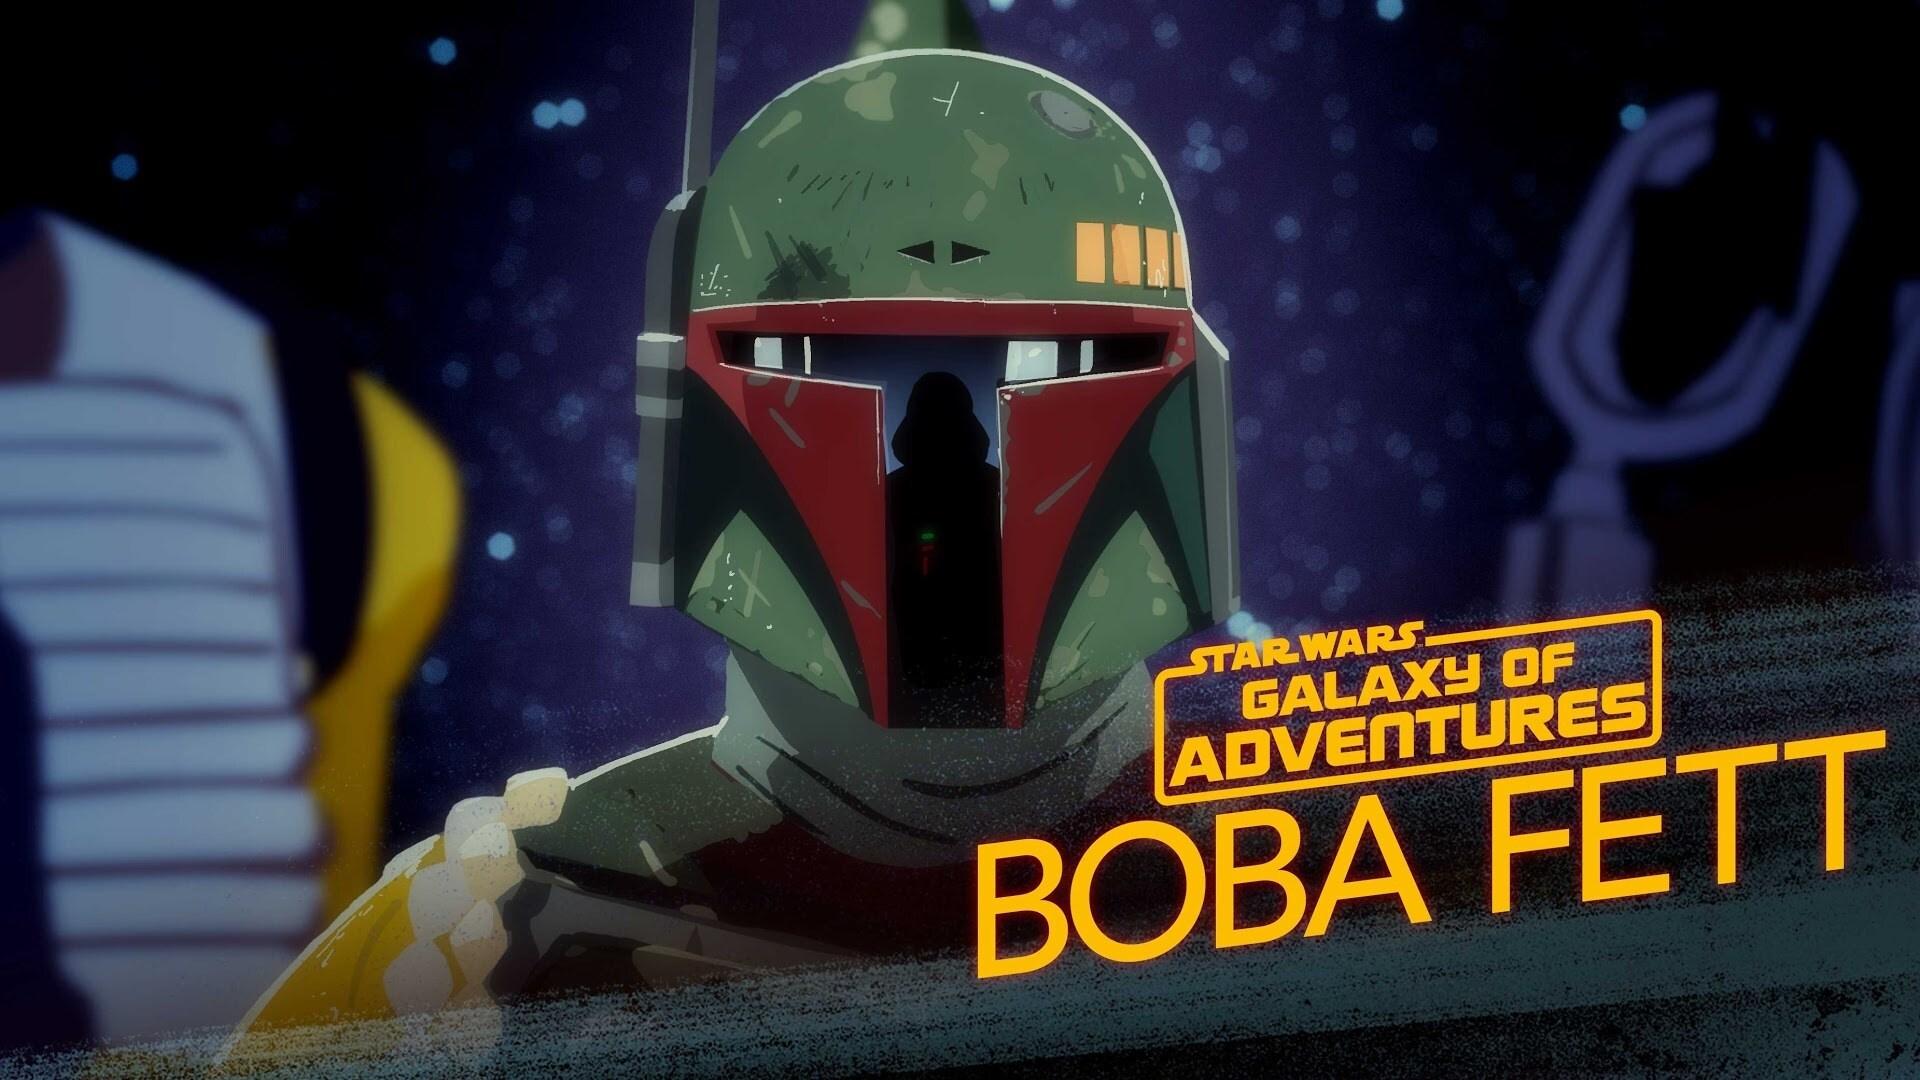 Boba Fett - The Bounty Hunter | Star Wars Galaxy of Adventures